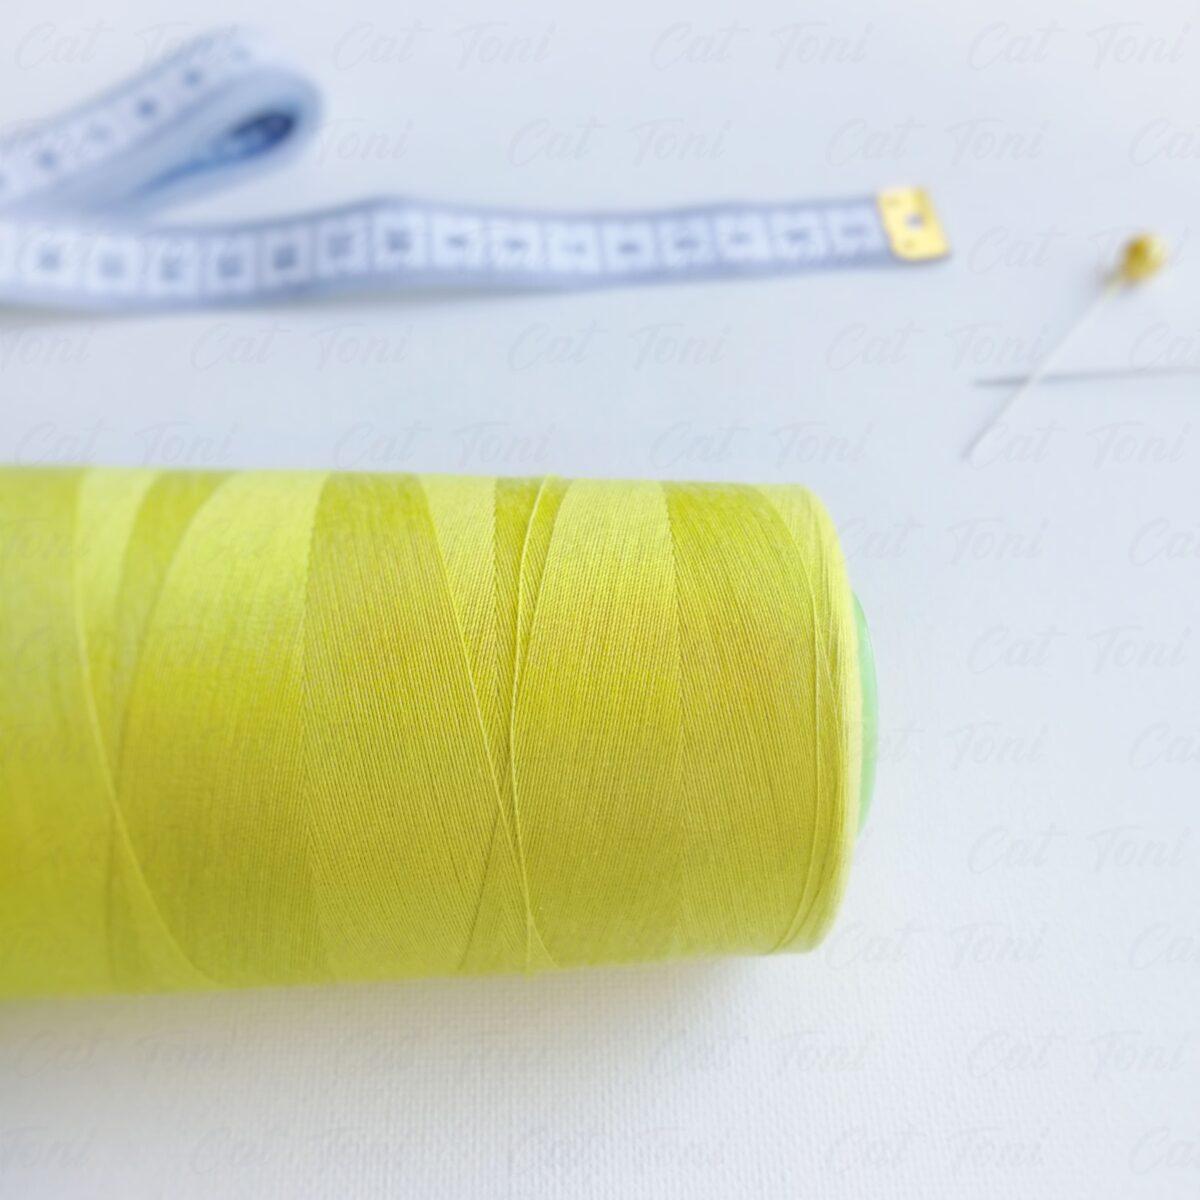 Бобины цвета Желто-зеленая нитка 5000 ярд